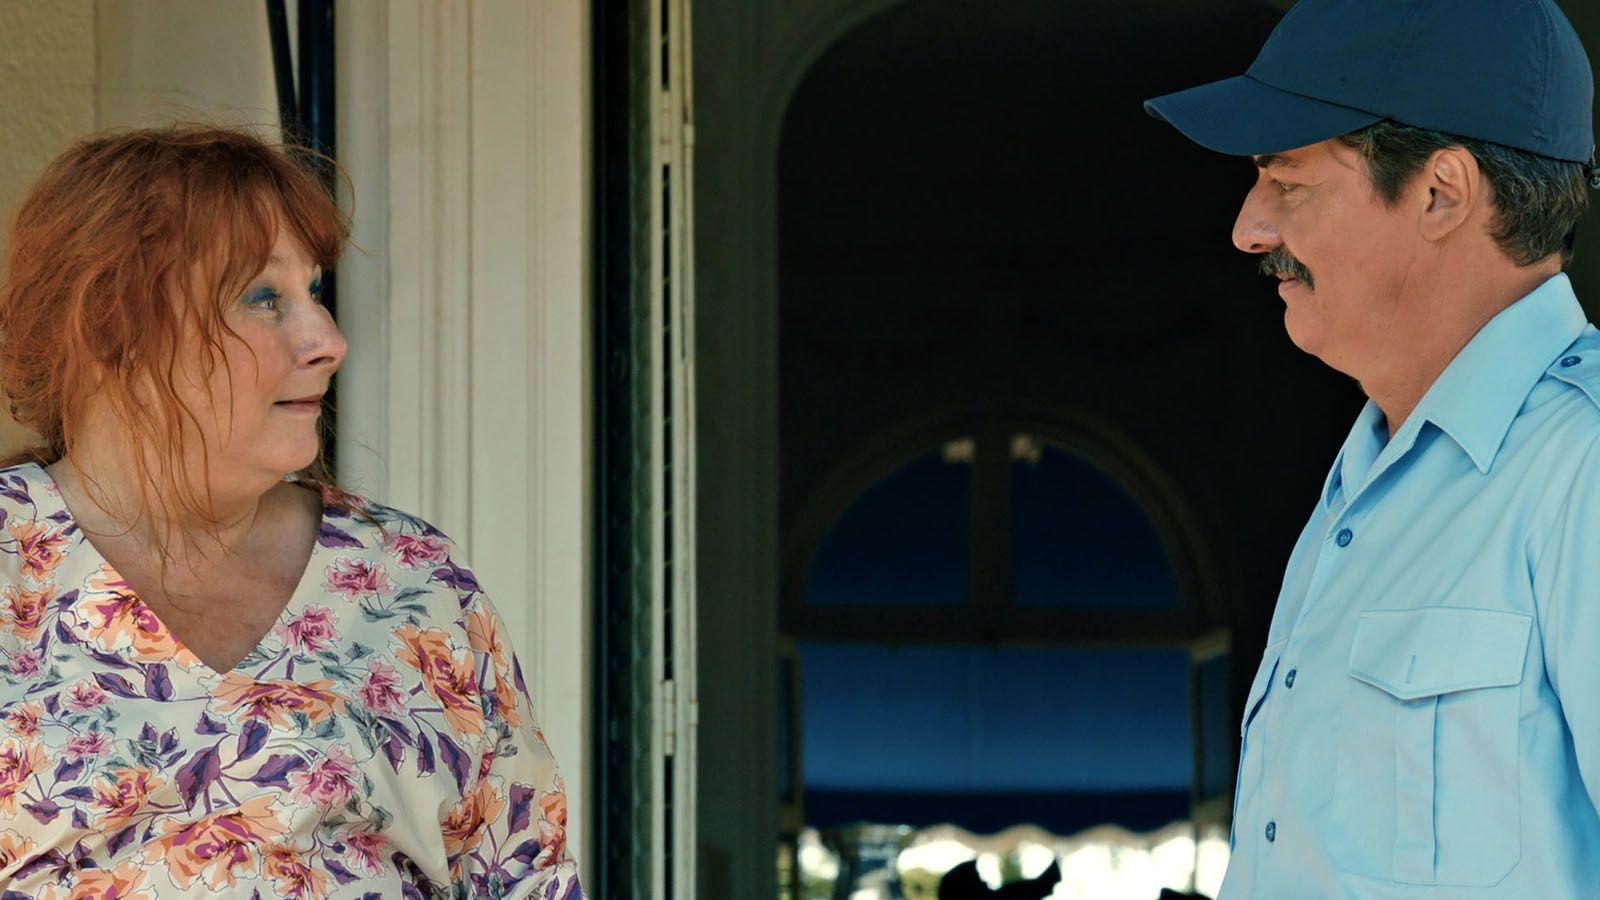 Les estivants (BANDE-ANNONCE) avec Valeria Bruni Tedeschi, Pierre Arditi, Valeria Golino - Le 30 janvier 2019 au cinéma